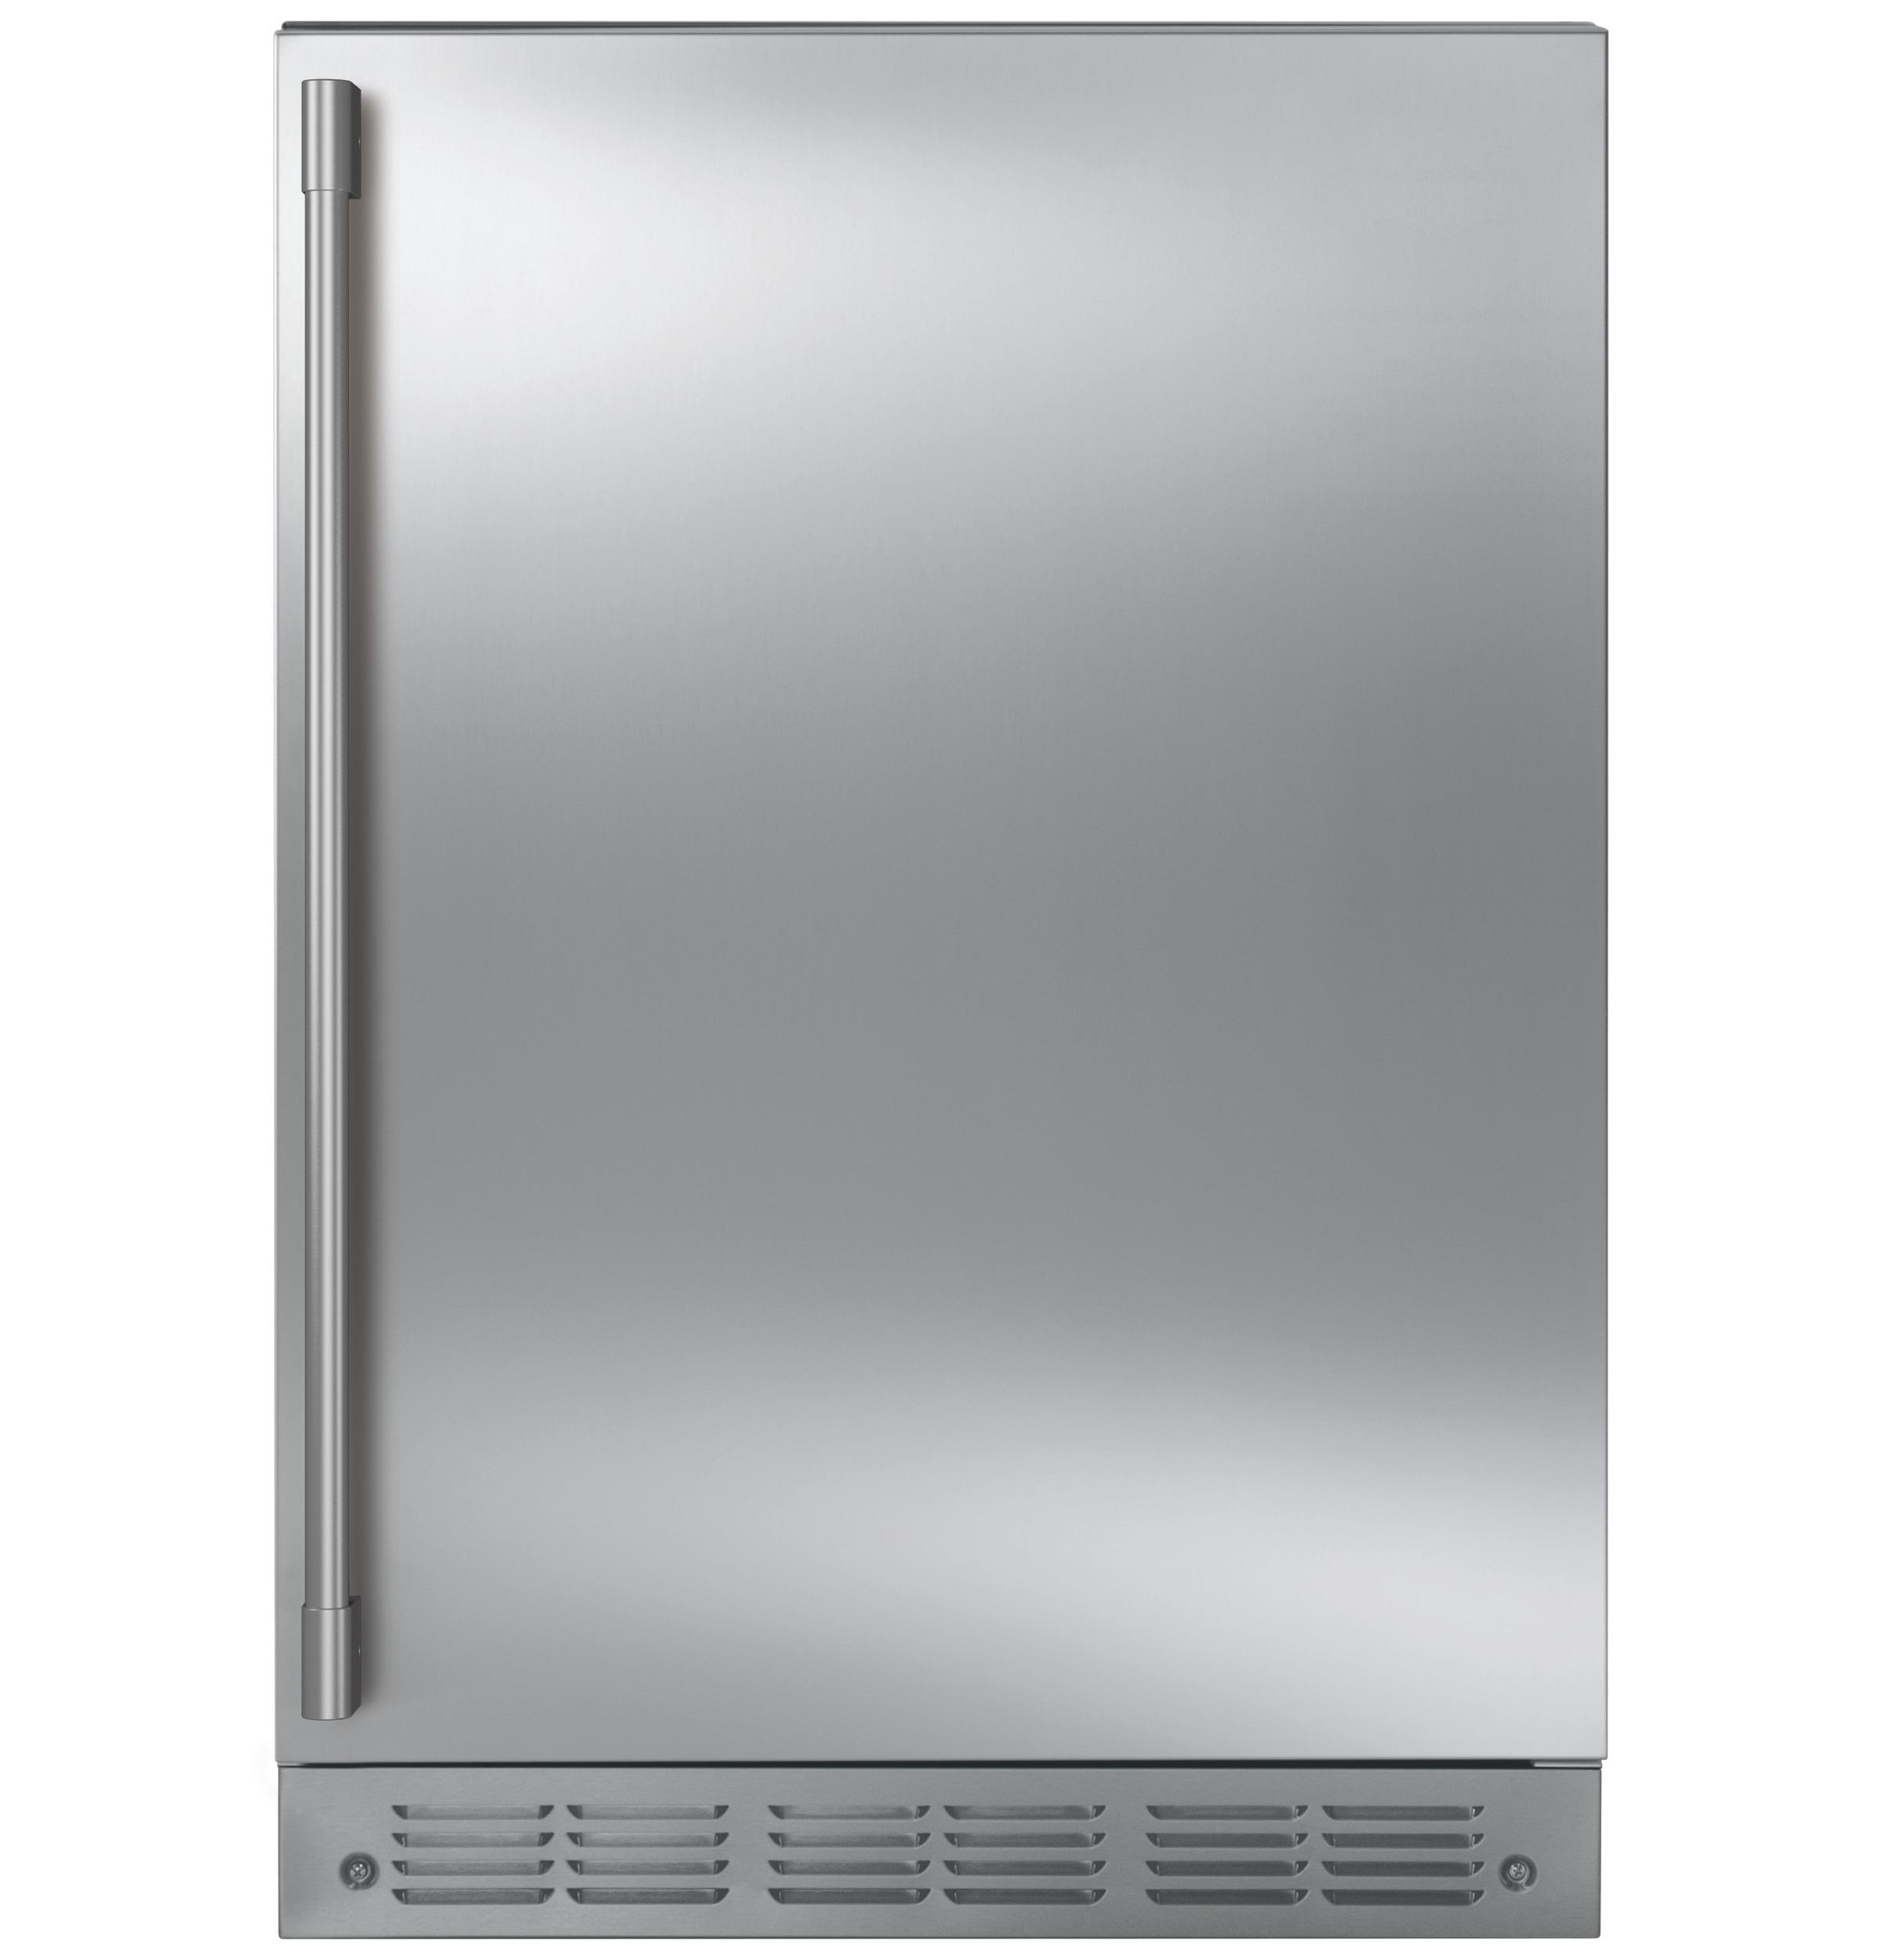 Monogram Monogram Bar Refrigerator with Icemaker